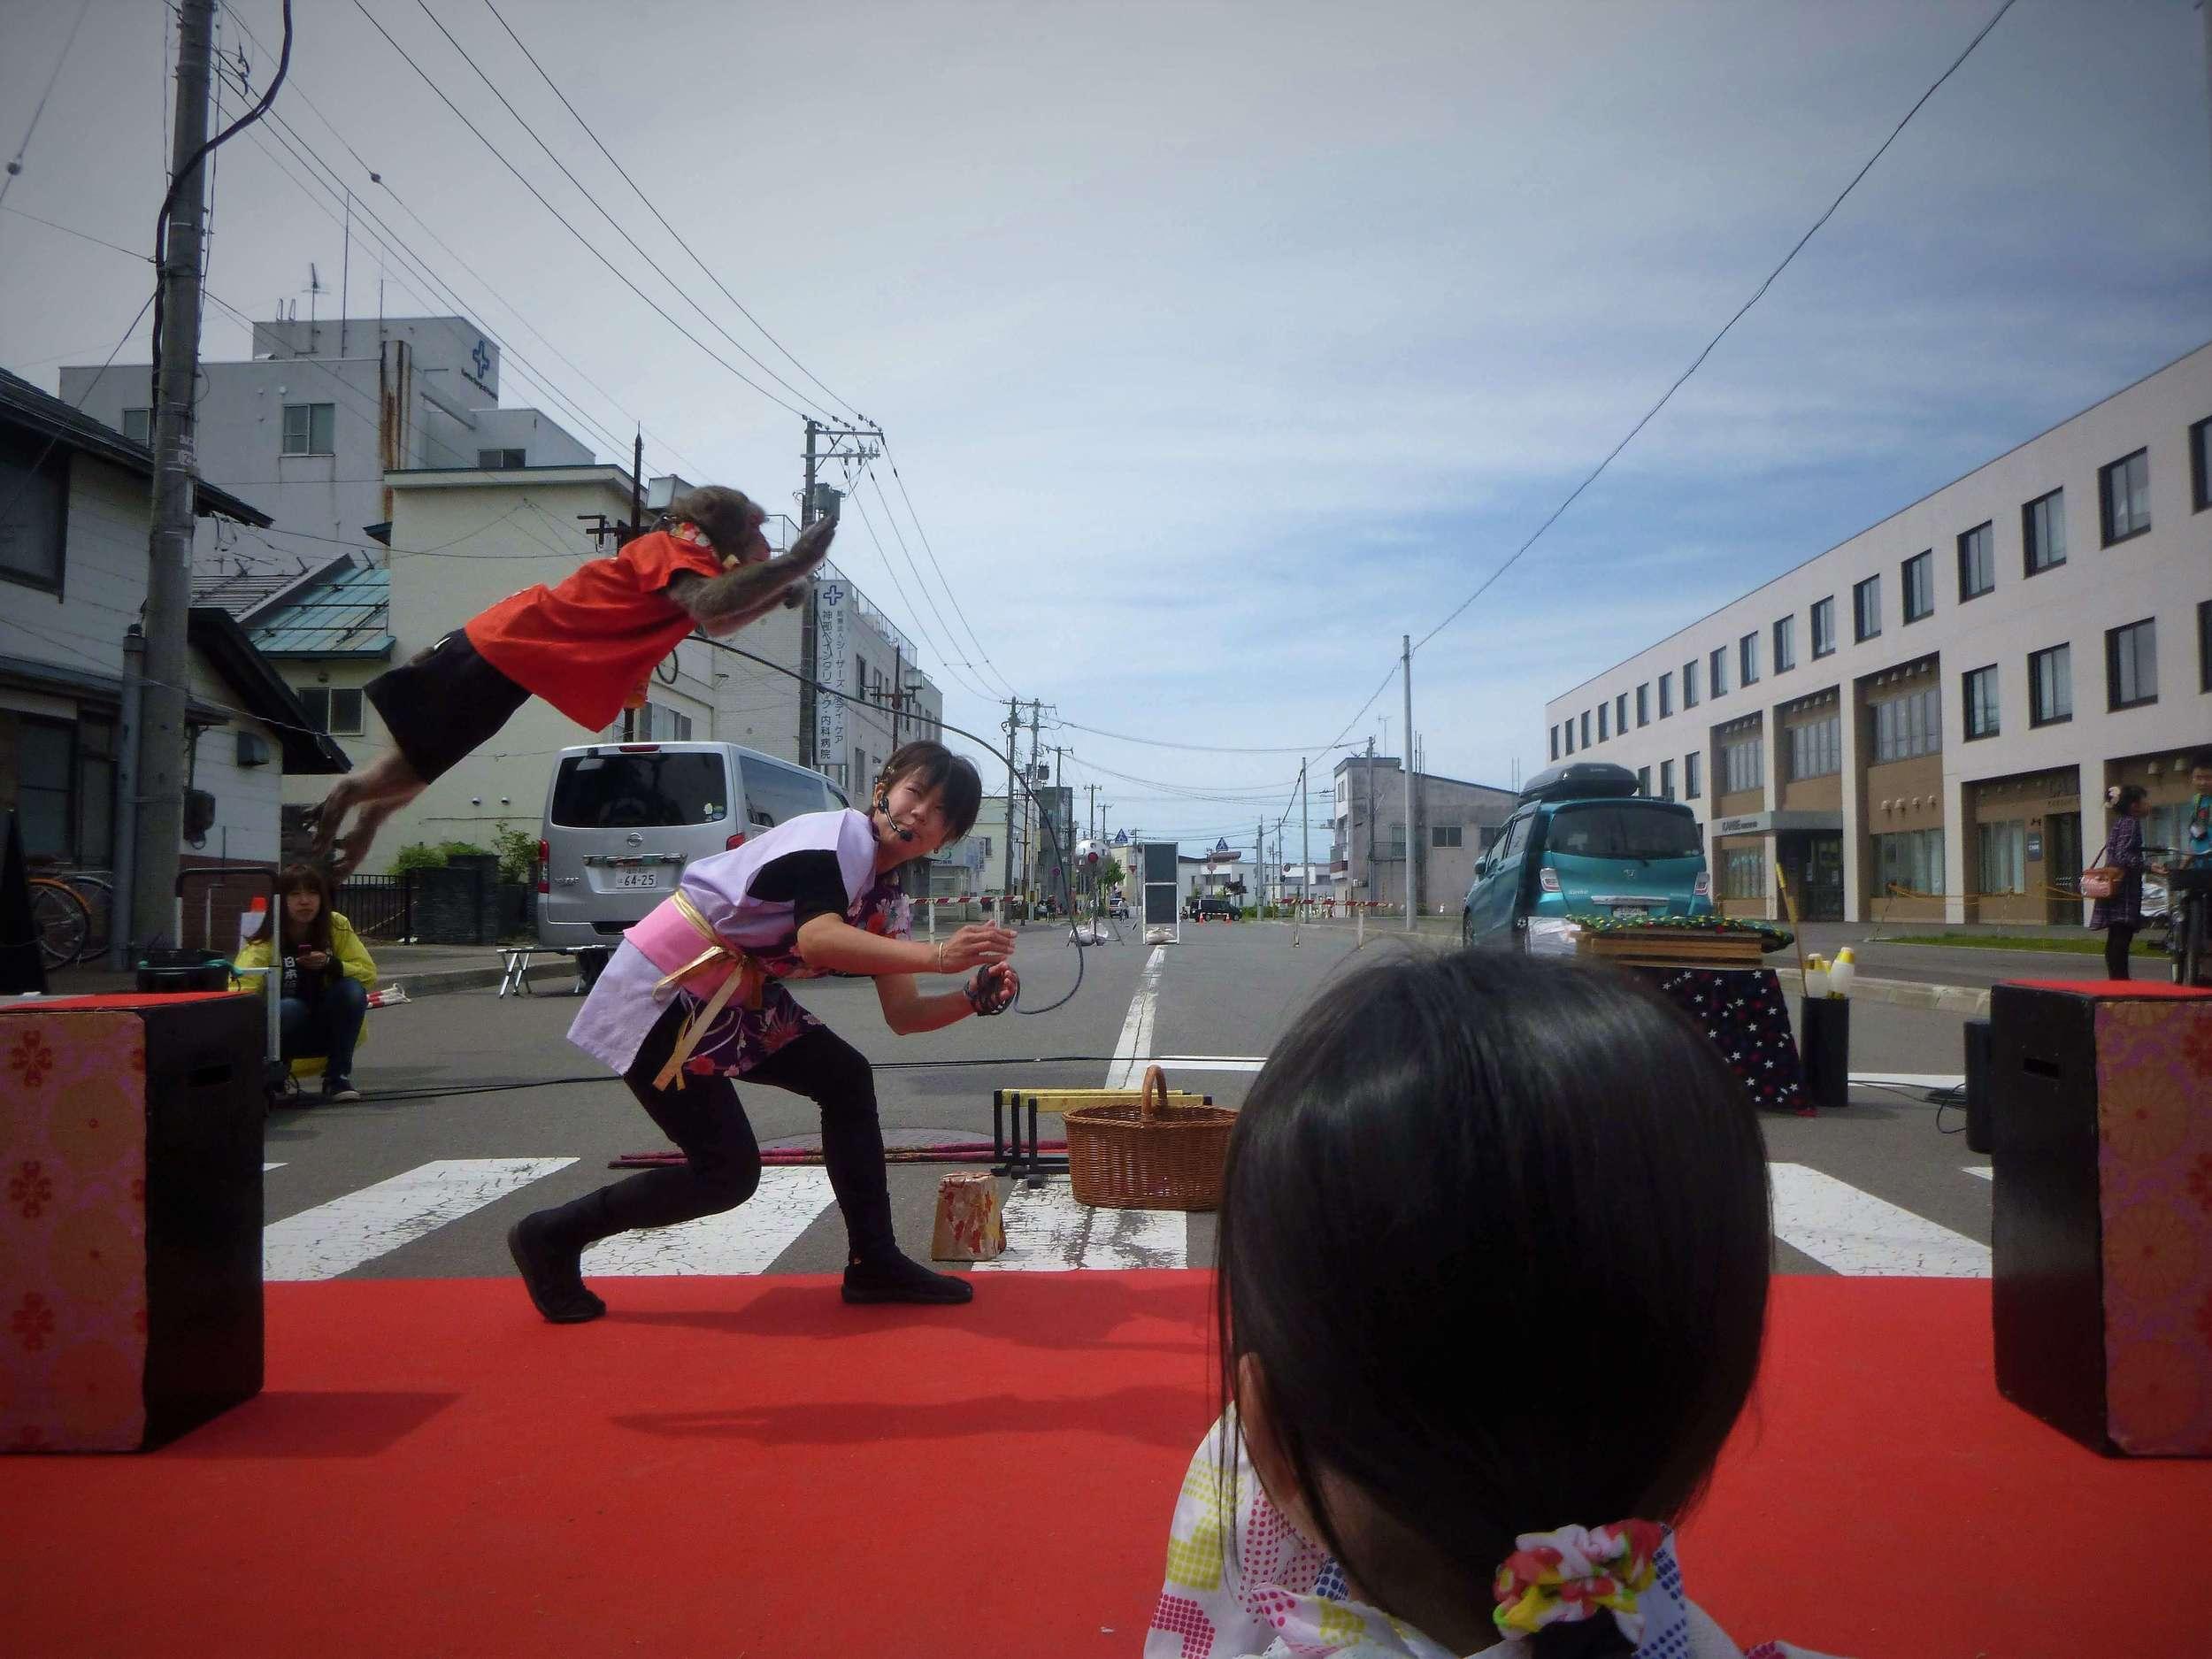 street performers acrobatics